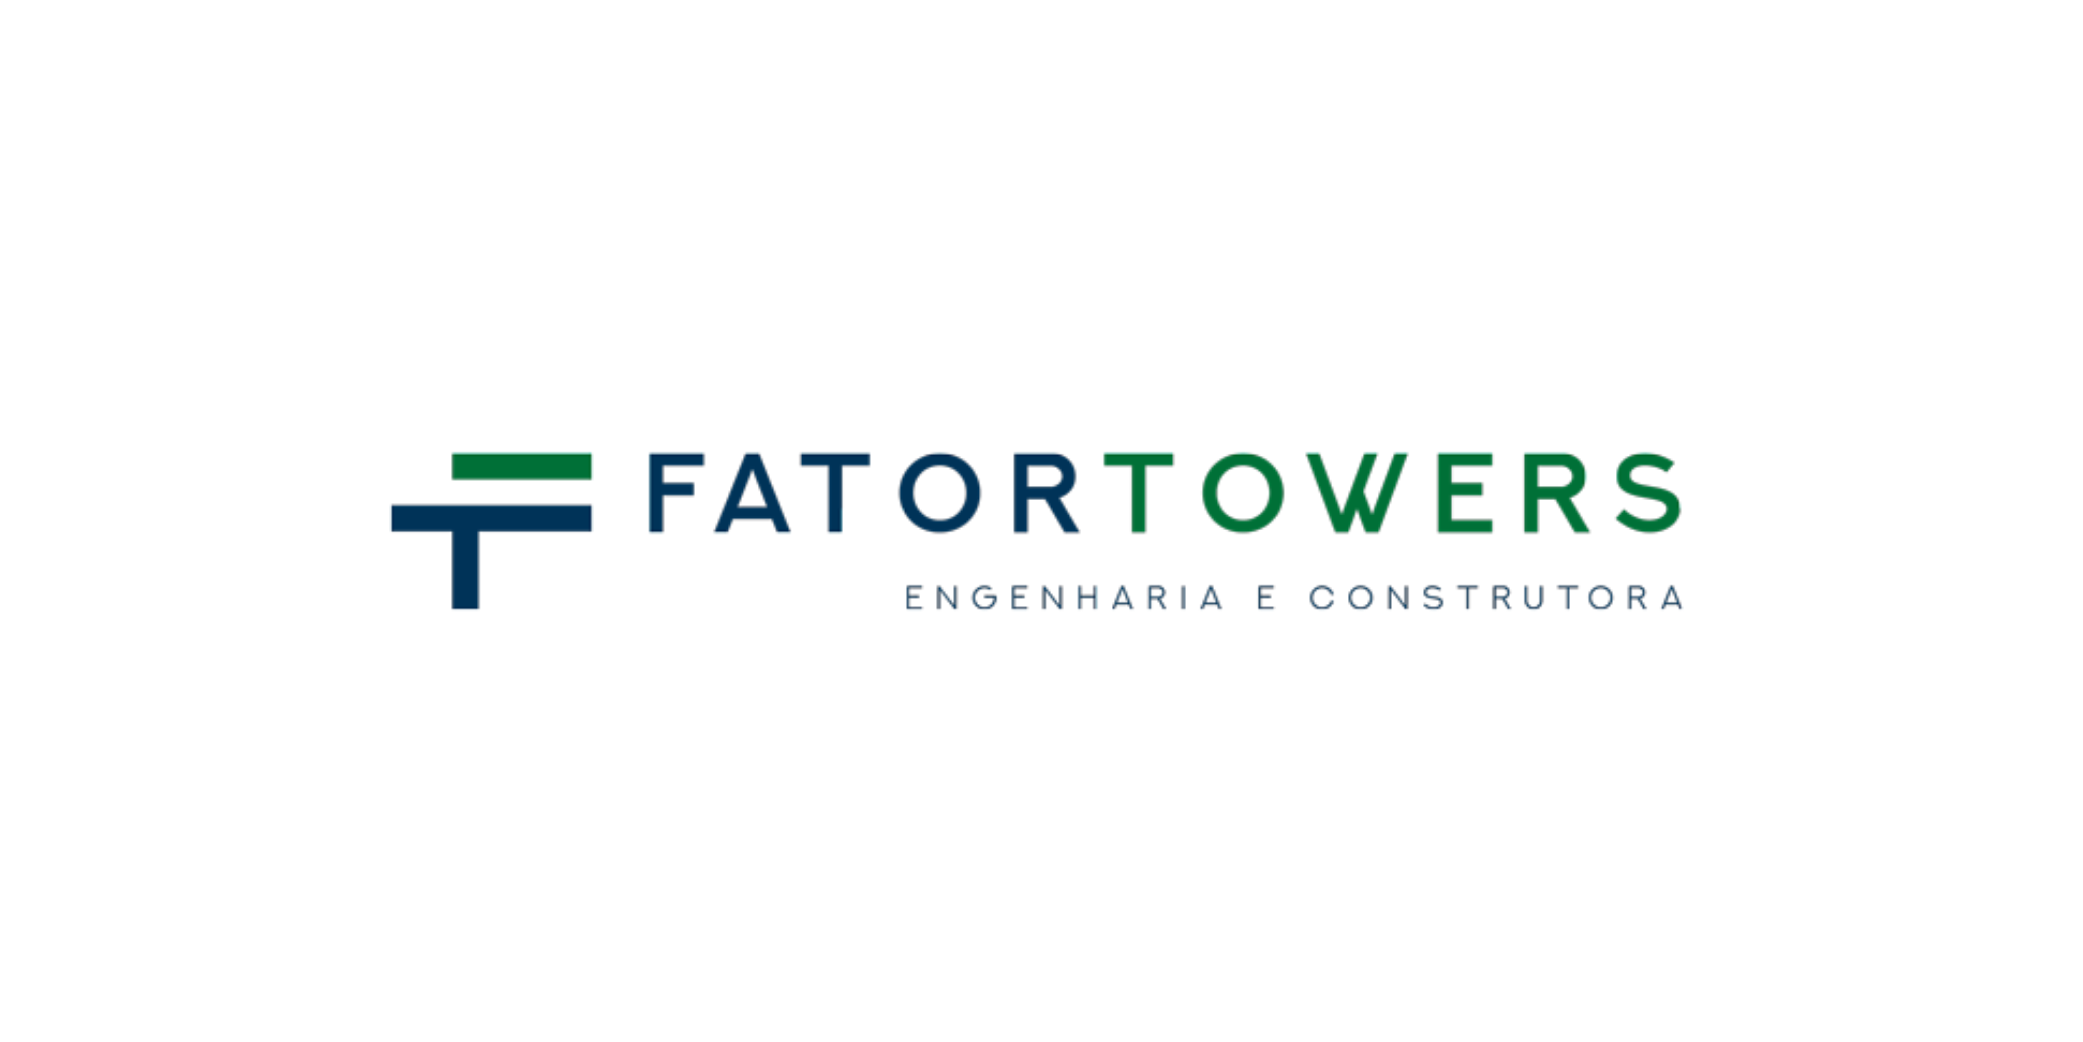 FatorTower-1.png